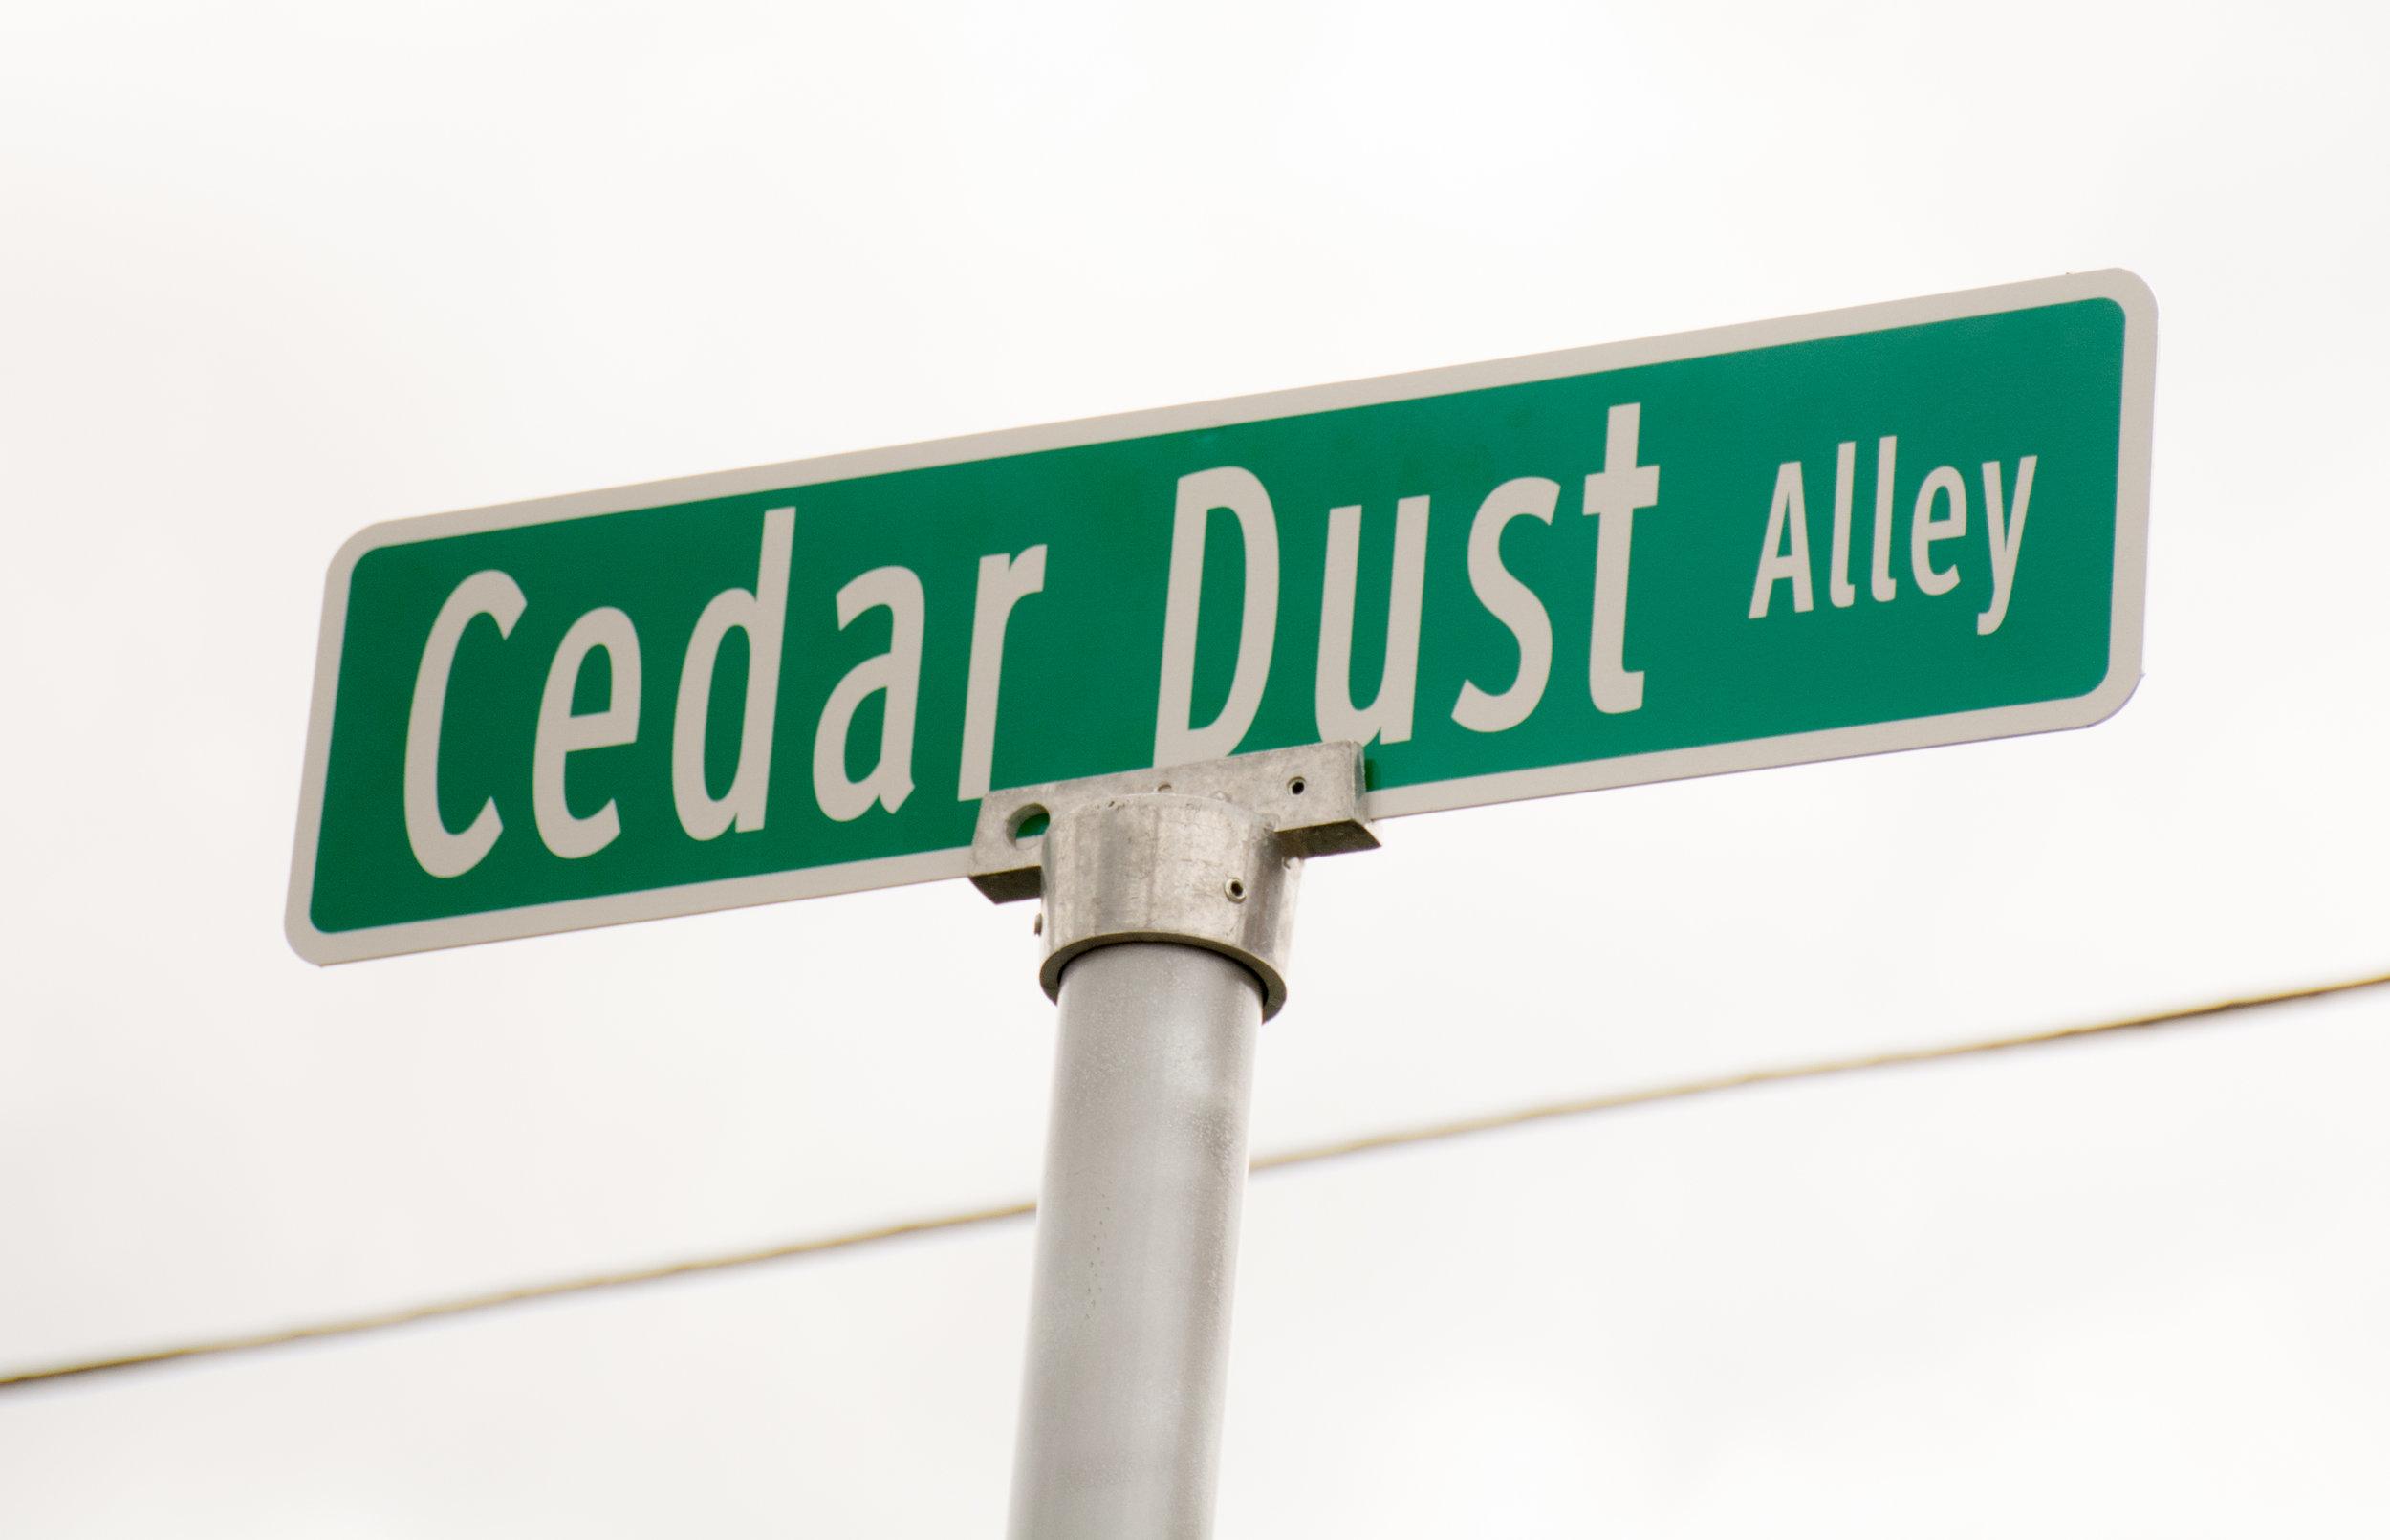 Cedar_Dust_Alley.jpg